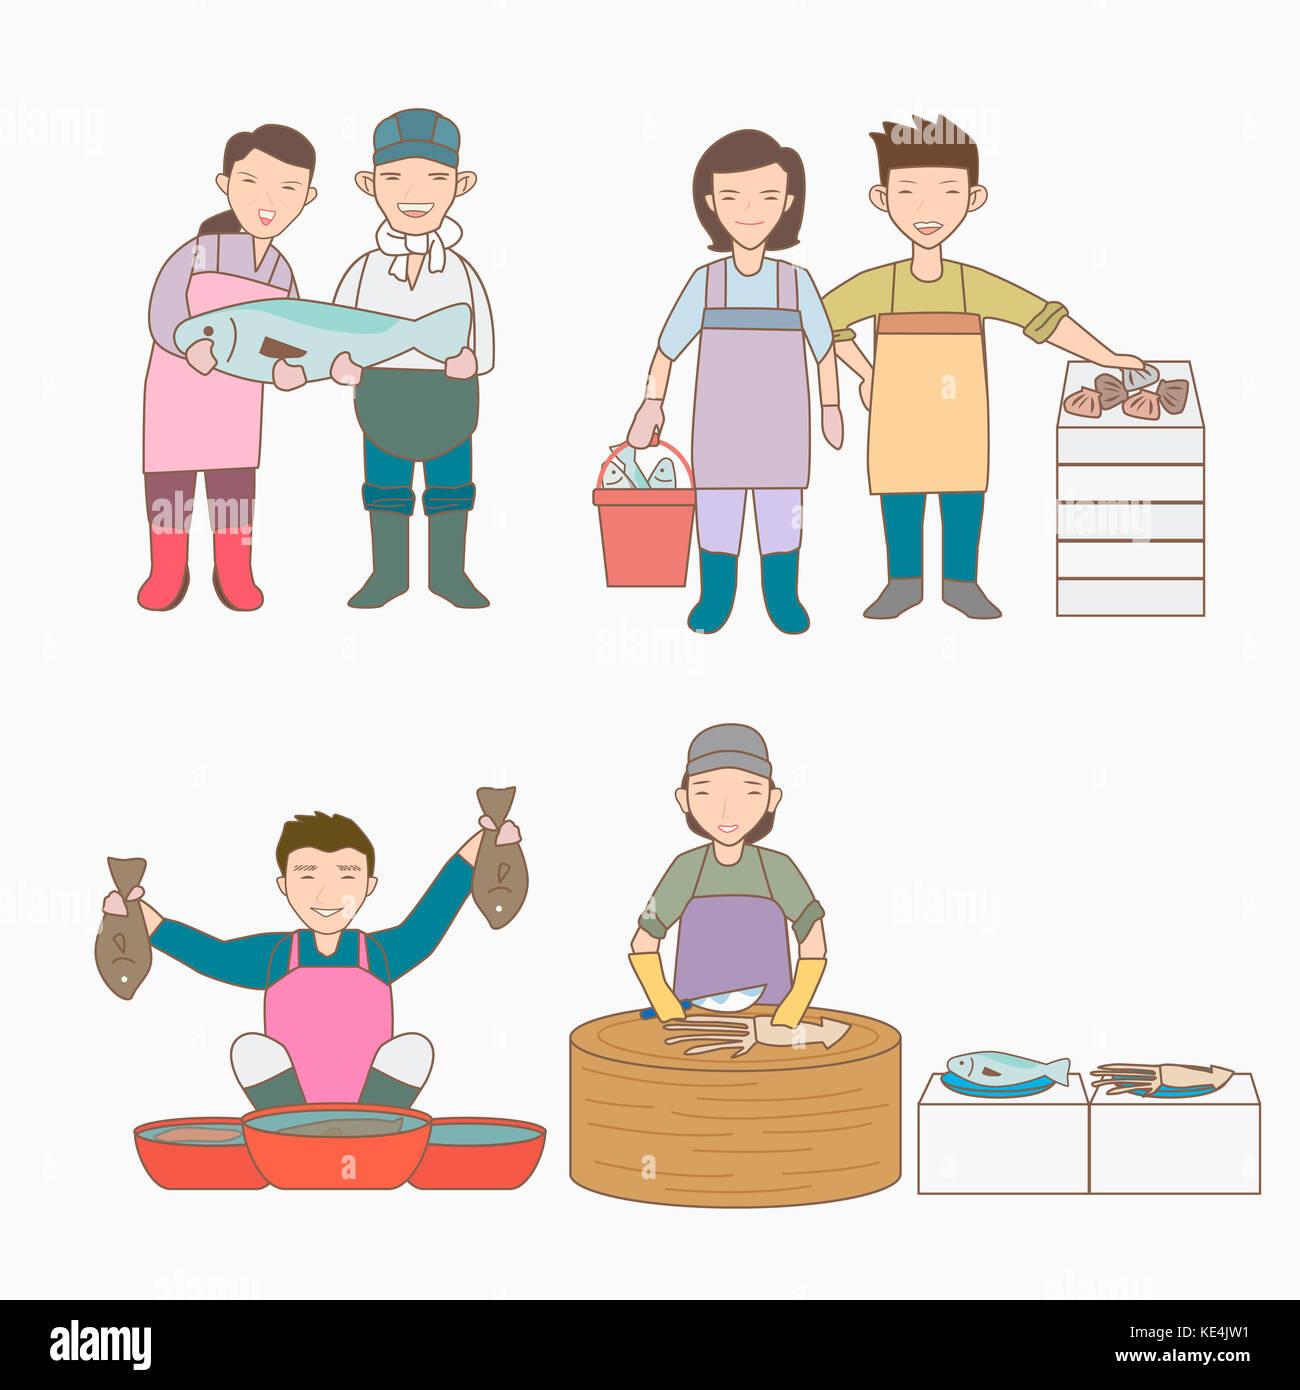 Illustration of smiling merchants at fish market - Stock Image